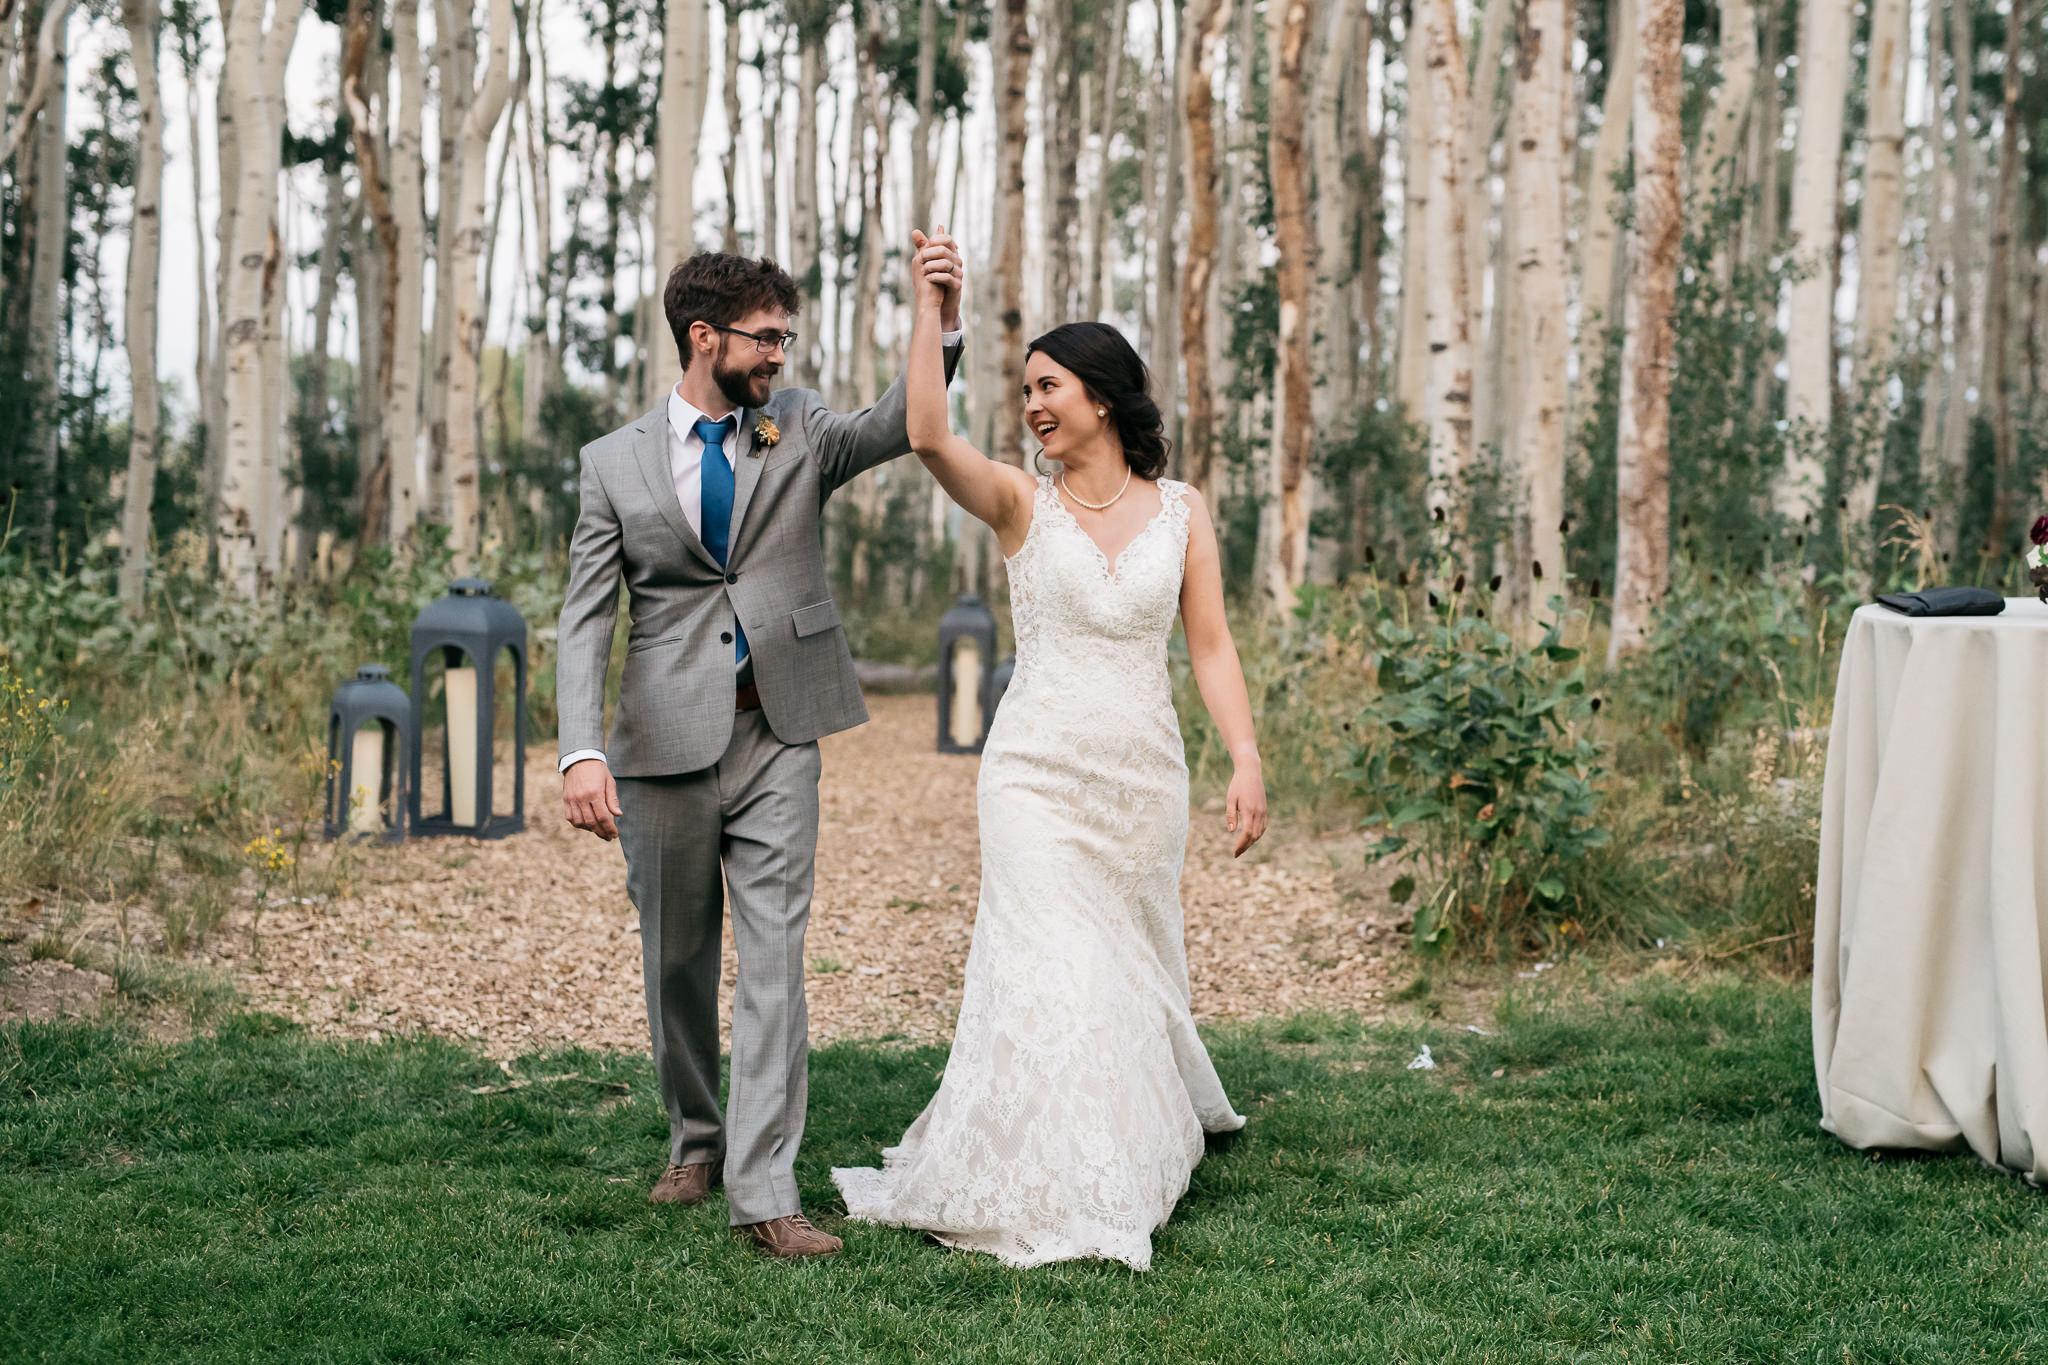 607_ONL_Kat_Nick_Wedding_Trevor_Hooper_Photo.jpg